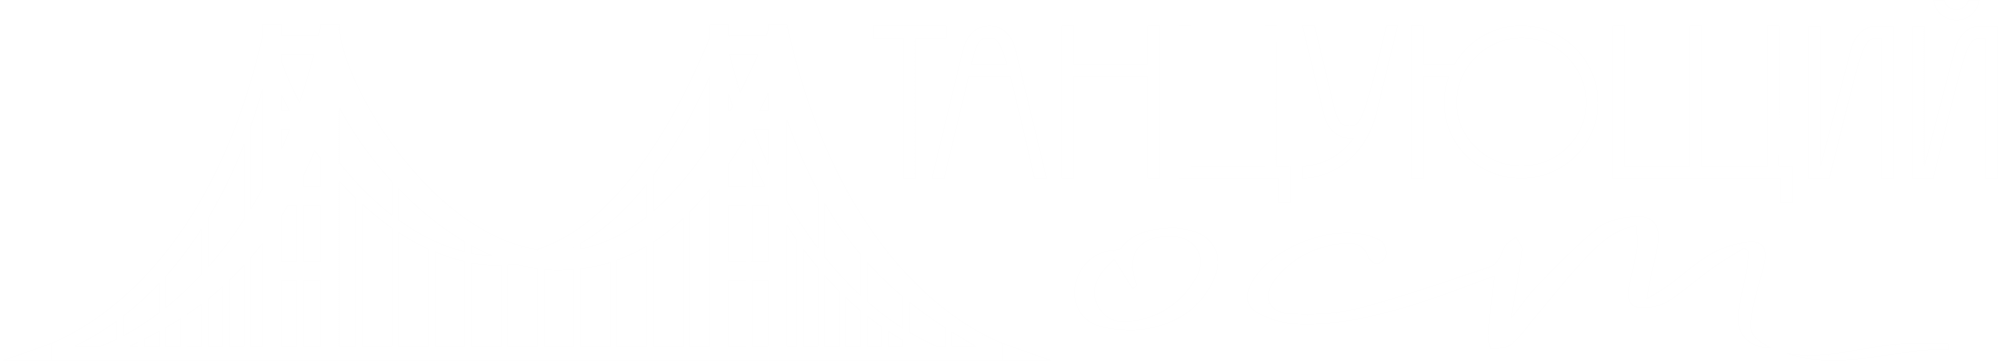 Танцующий Мост Online 2020 2021 логотип